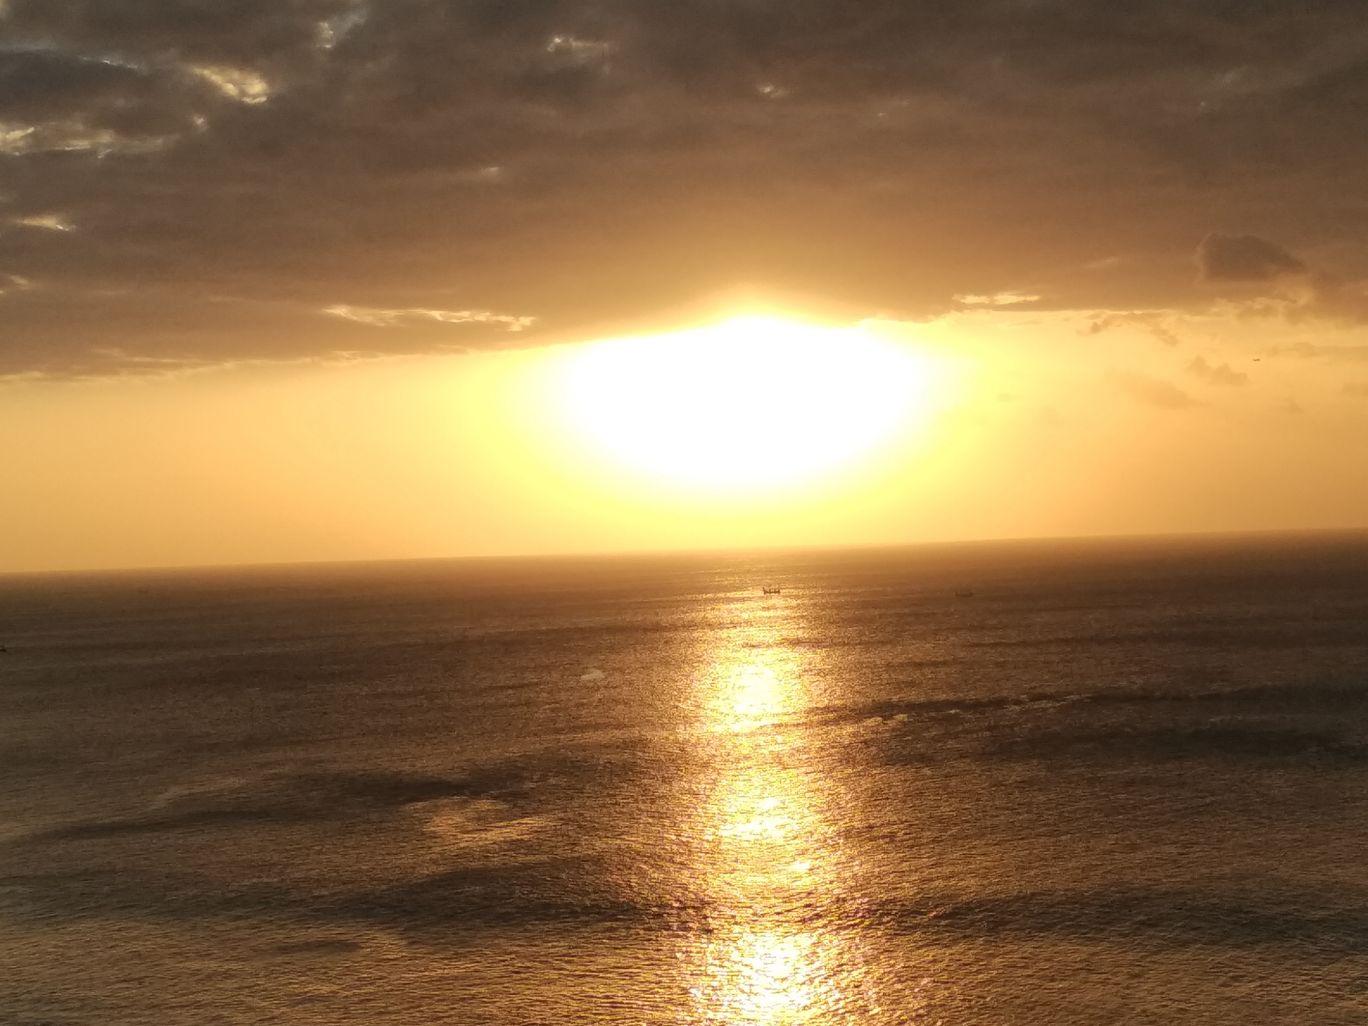 Photo of Bali By ashish rajpal